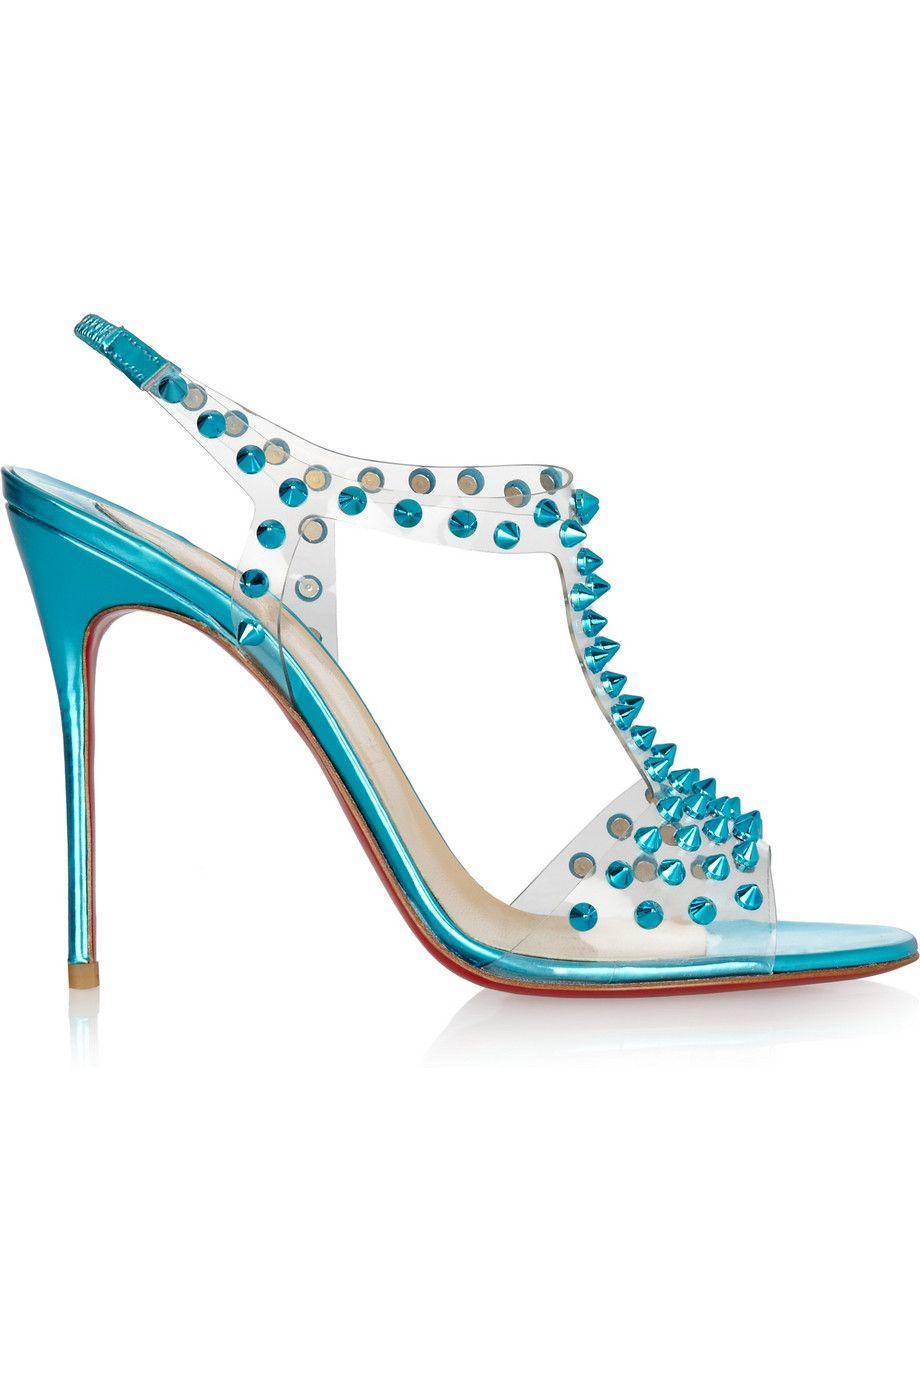 Christian Louboutin shoes - perfect!